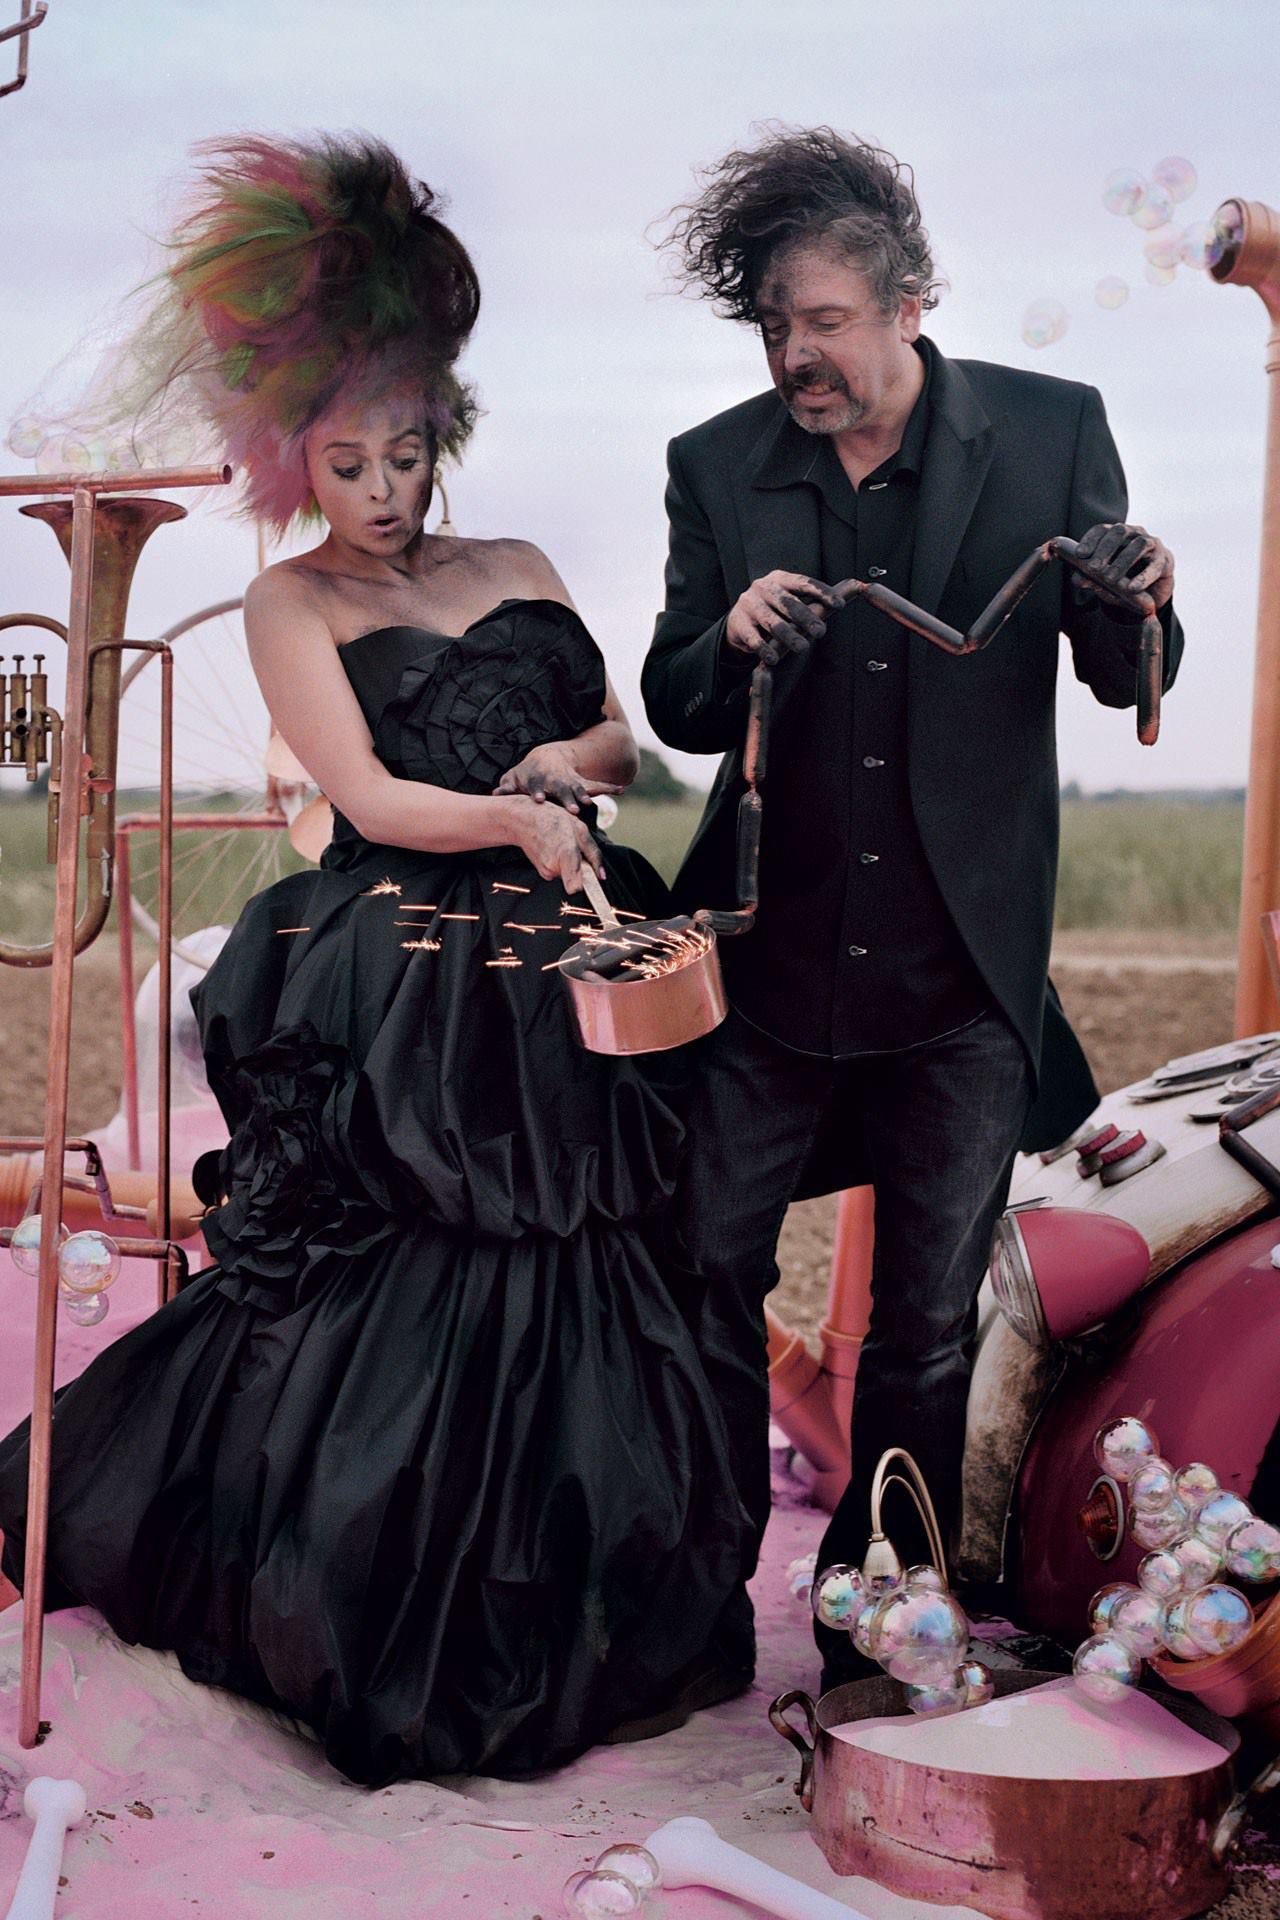 Chi è Helena Bonham Carter